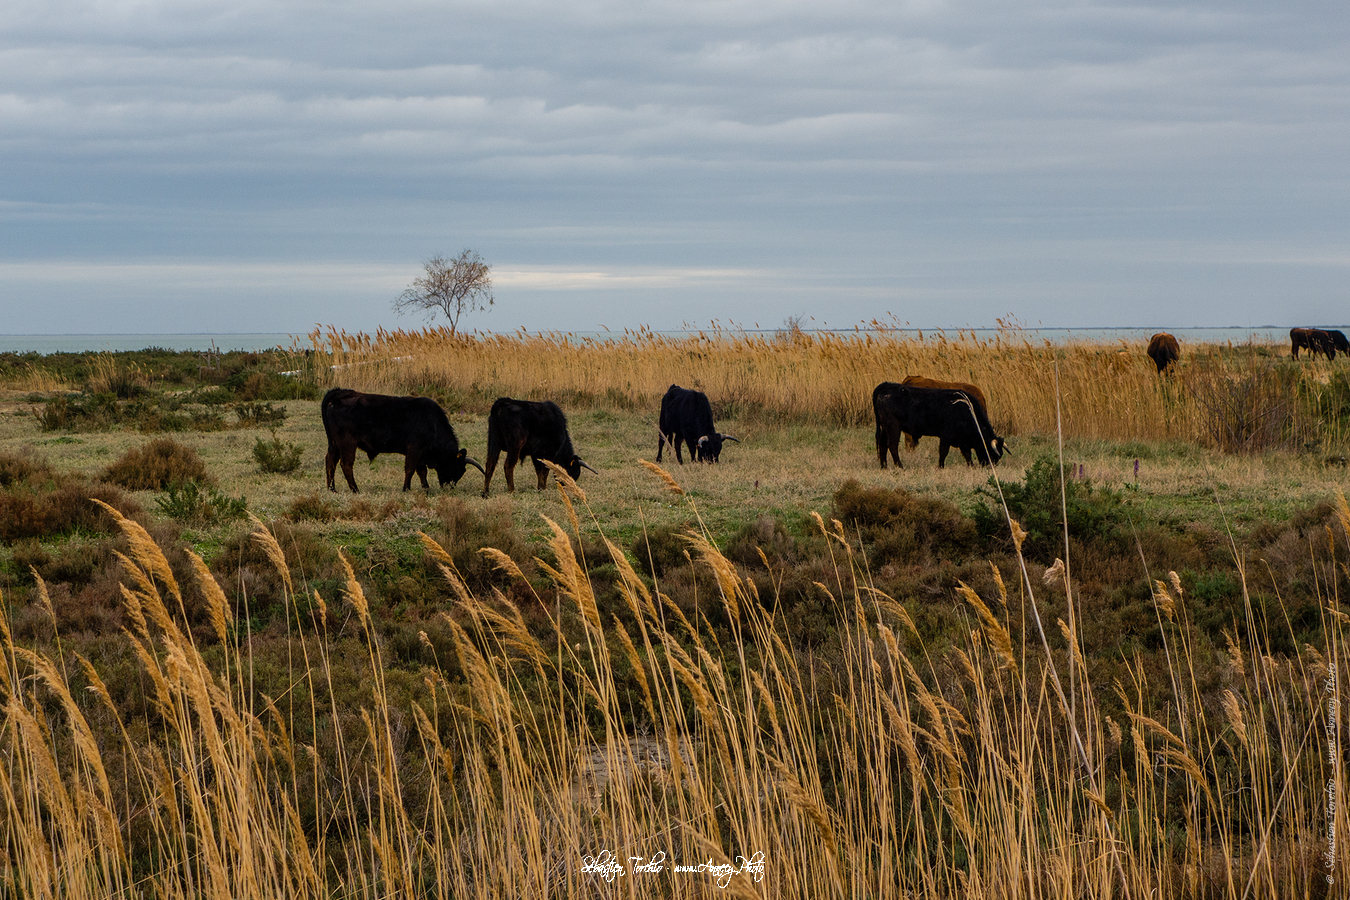 Vache Camarguaise - © Sébastien TORCHIO, www.Annecy.Photo